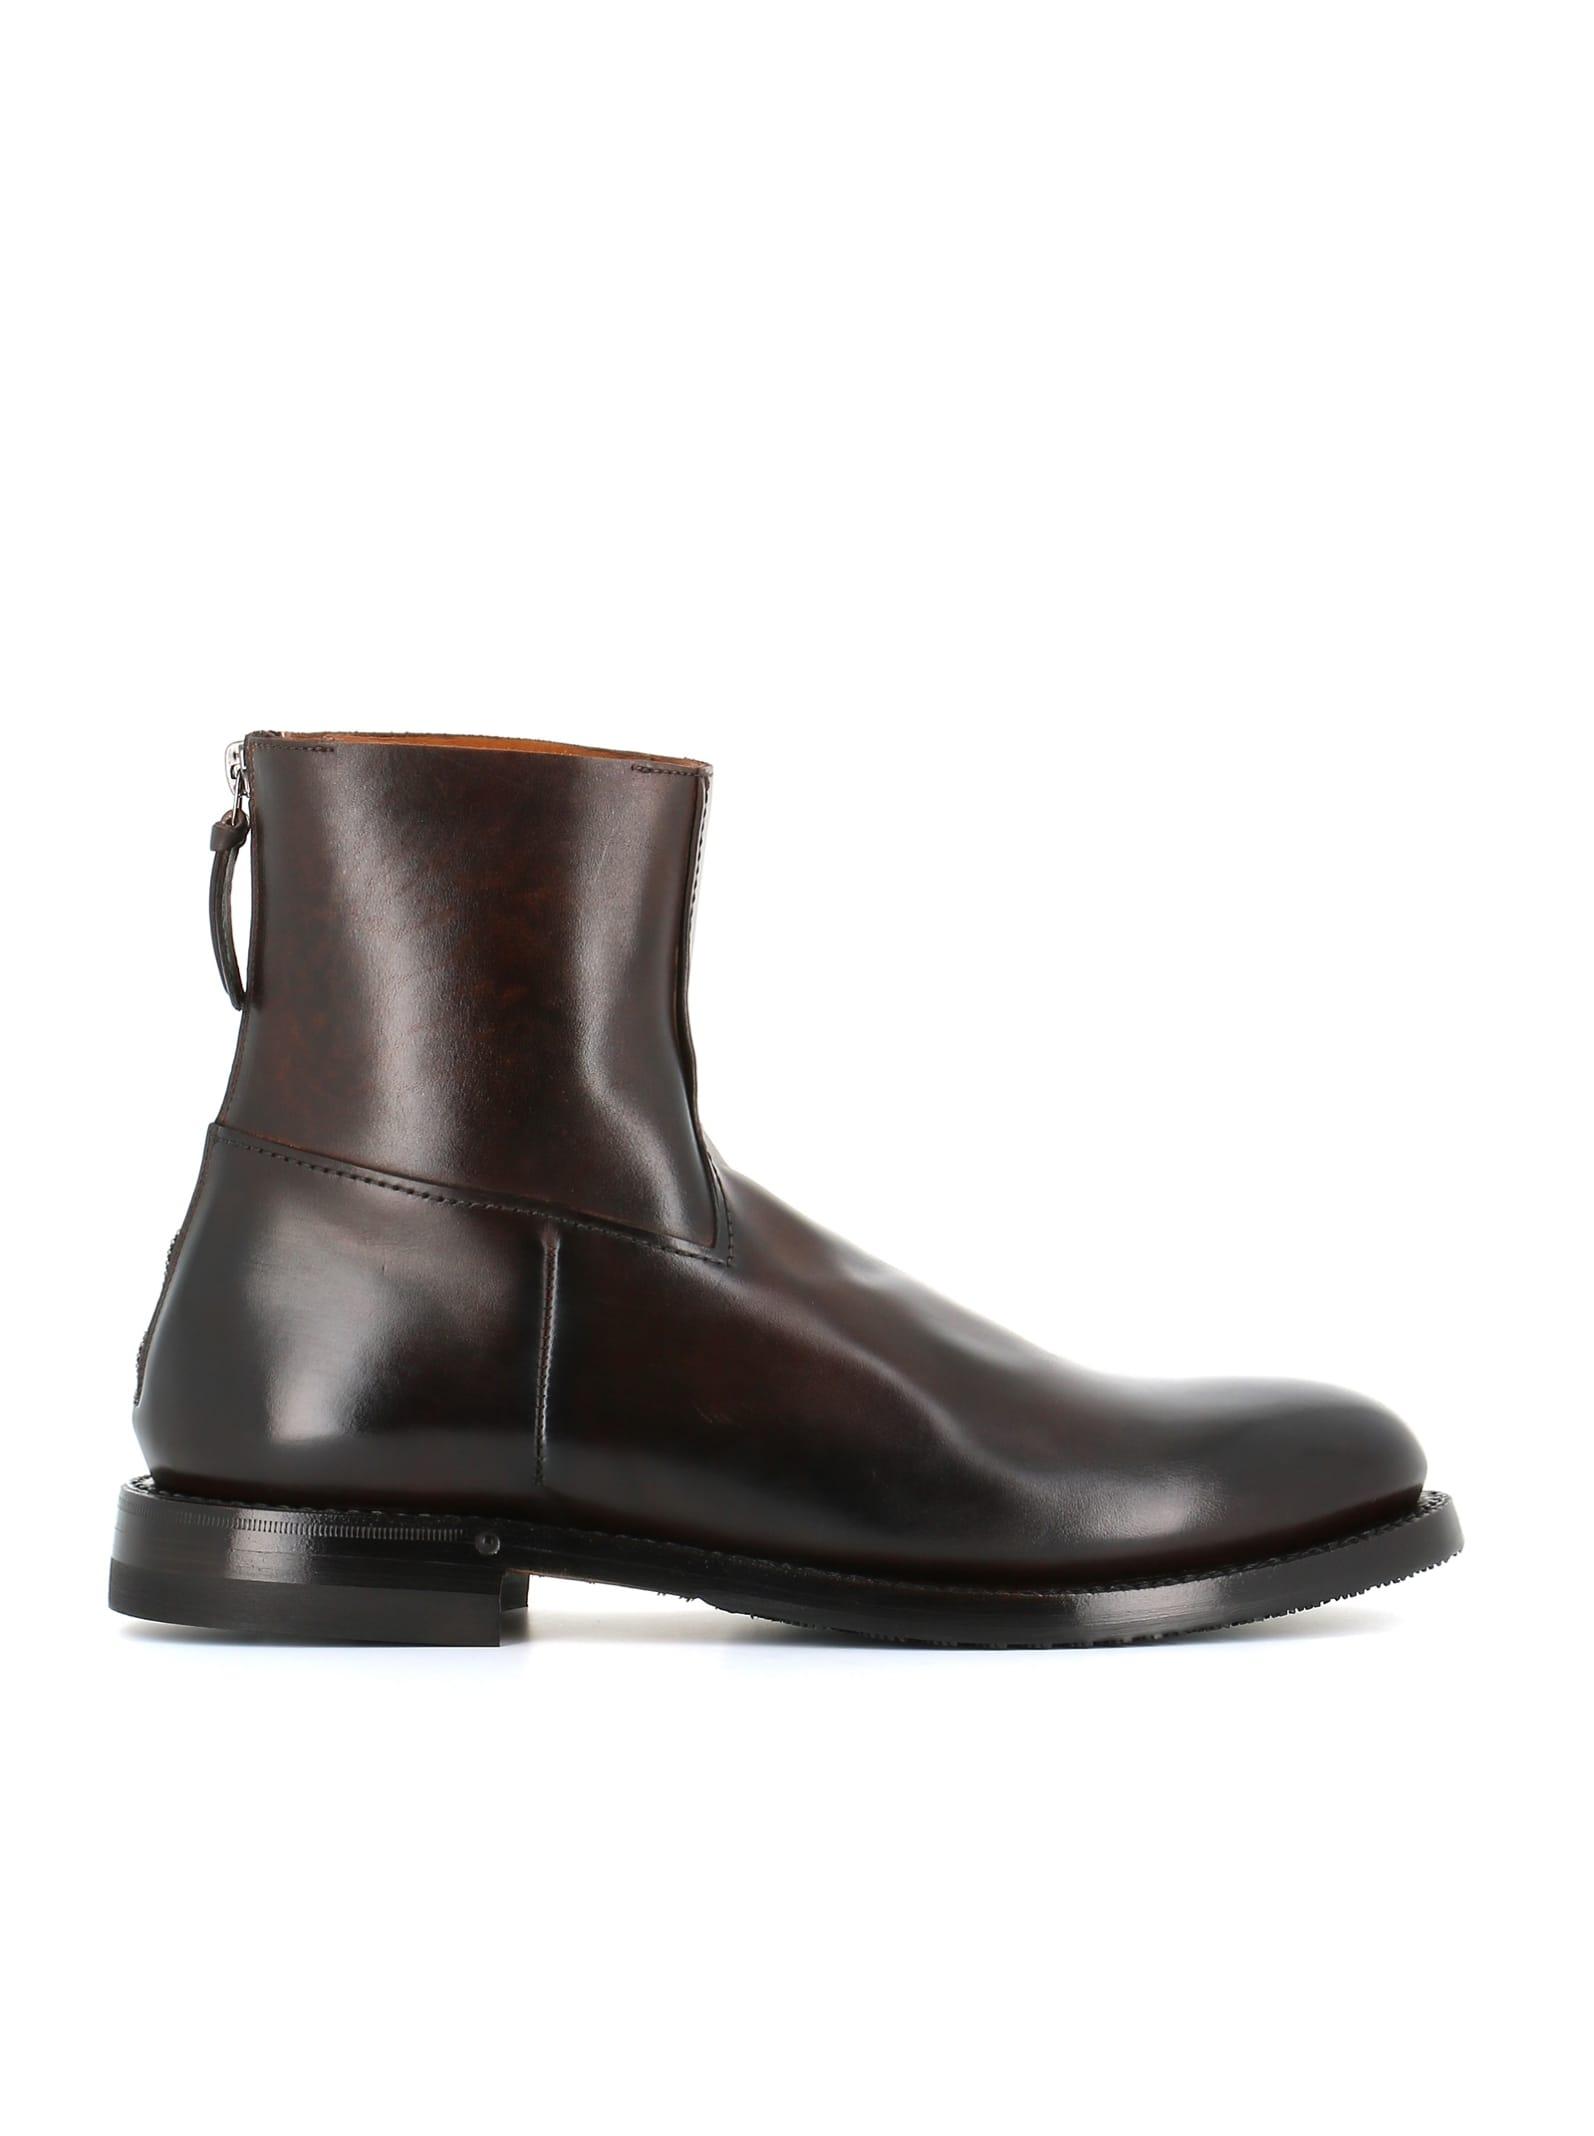 Silvano Sassetti Ankle Boot